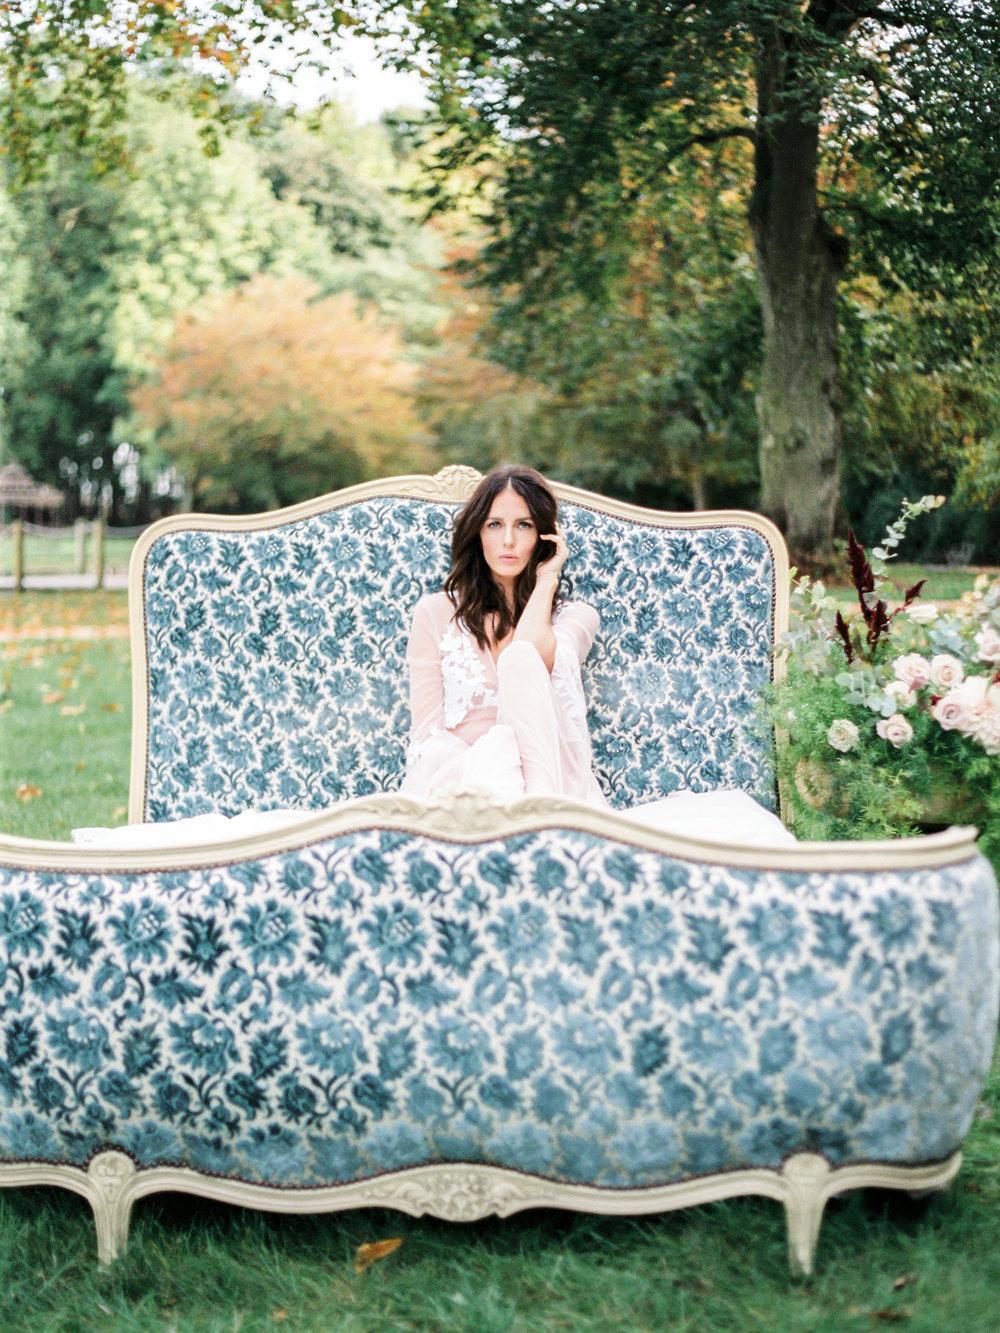 JacquelineAnnePhotography-Boudoir-Outdoors-5-2.jpg